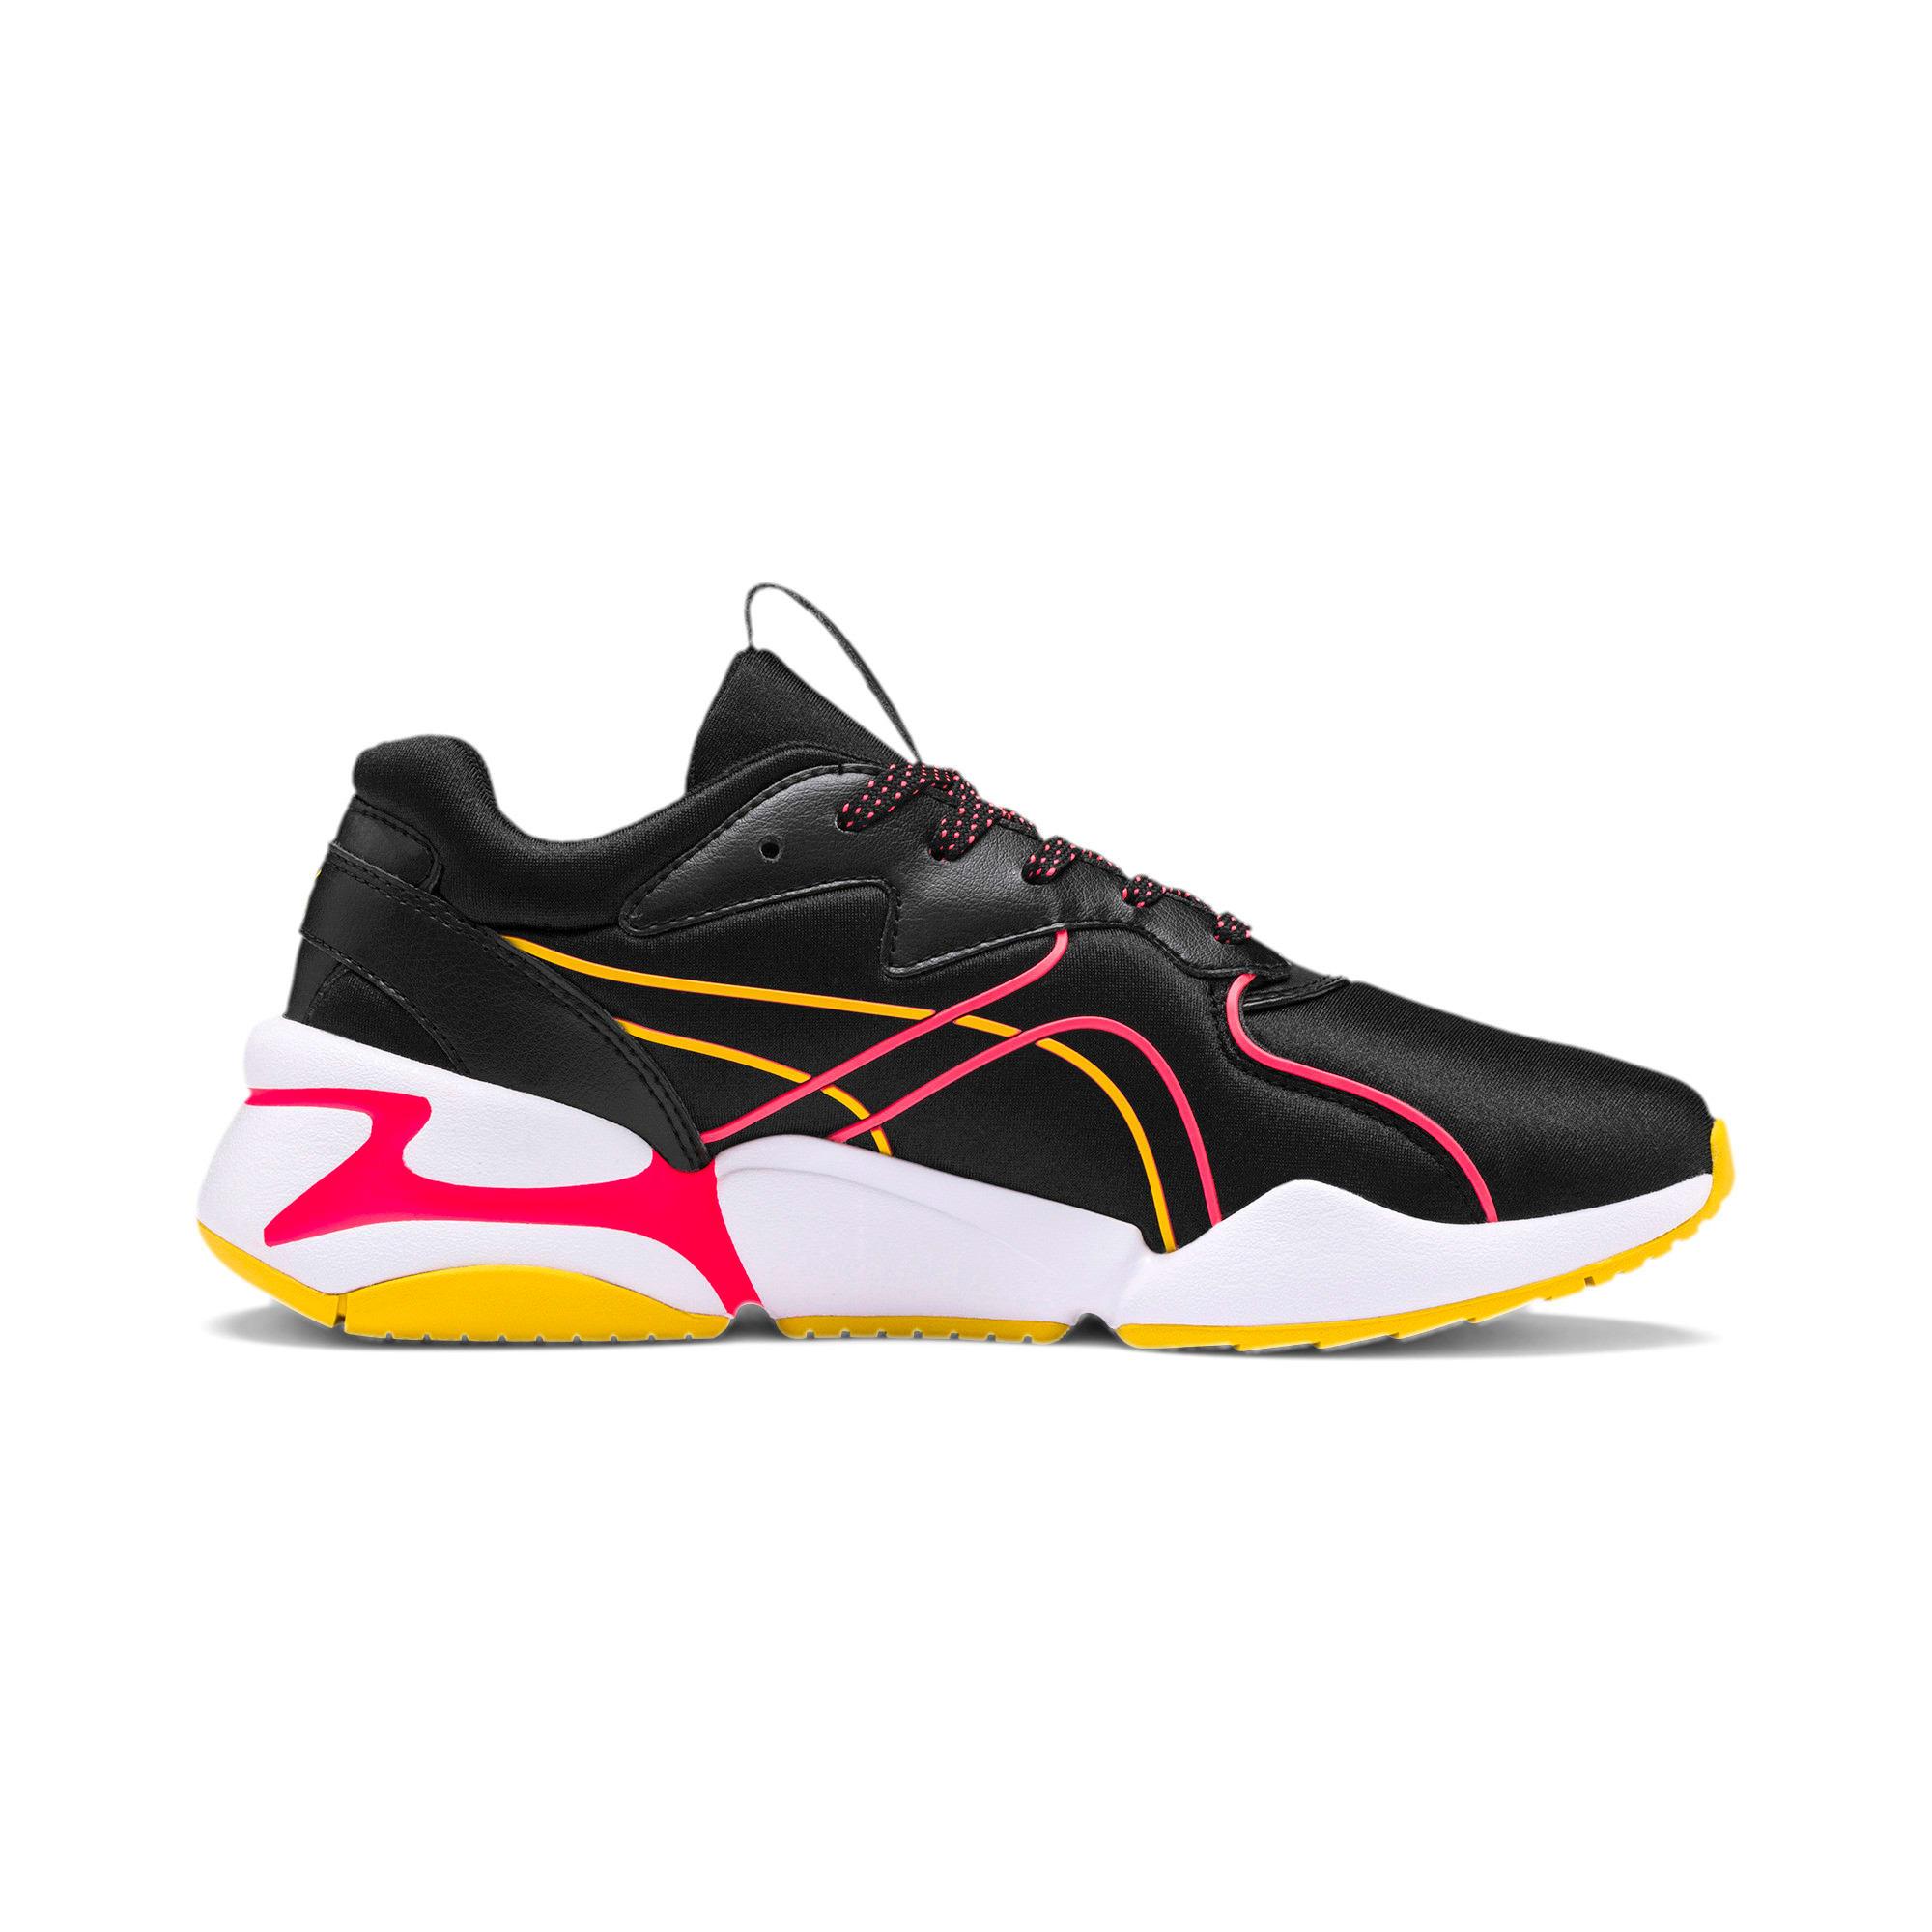 Thumbnail 6 of Nova Hypertech Women's Sneakers, Puma Black, medium